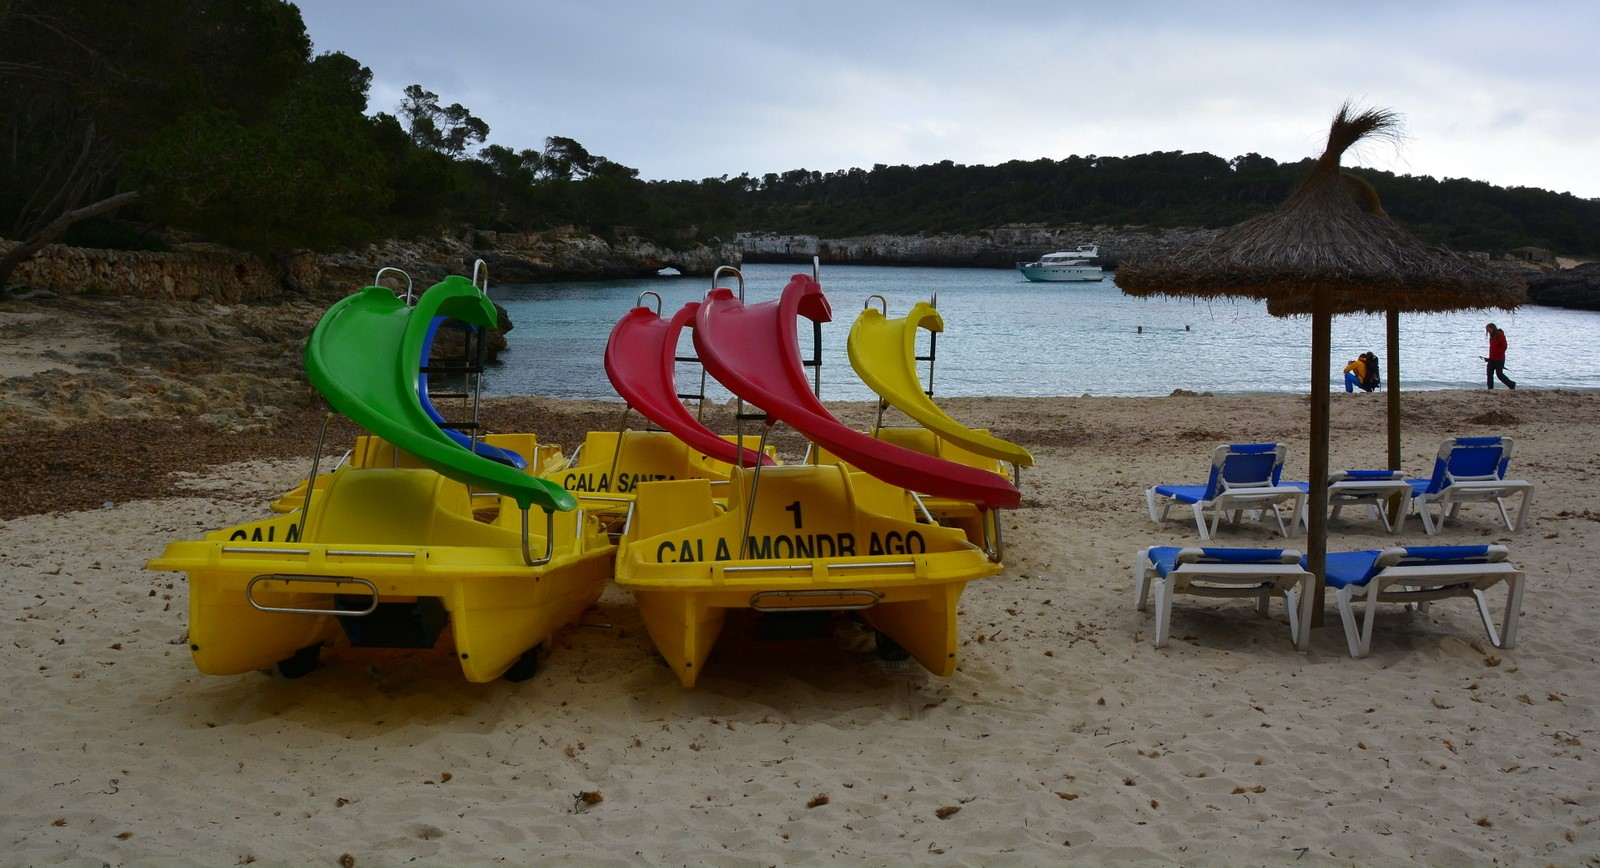 Mein perfektes Mallorca Wochenende staedtereisen sonne land und leute mallorca familie europa  tui berlin mallorca cala mondrago strand